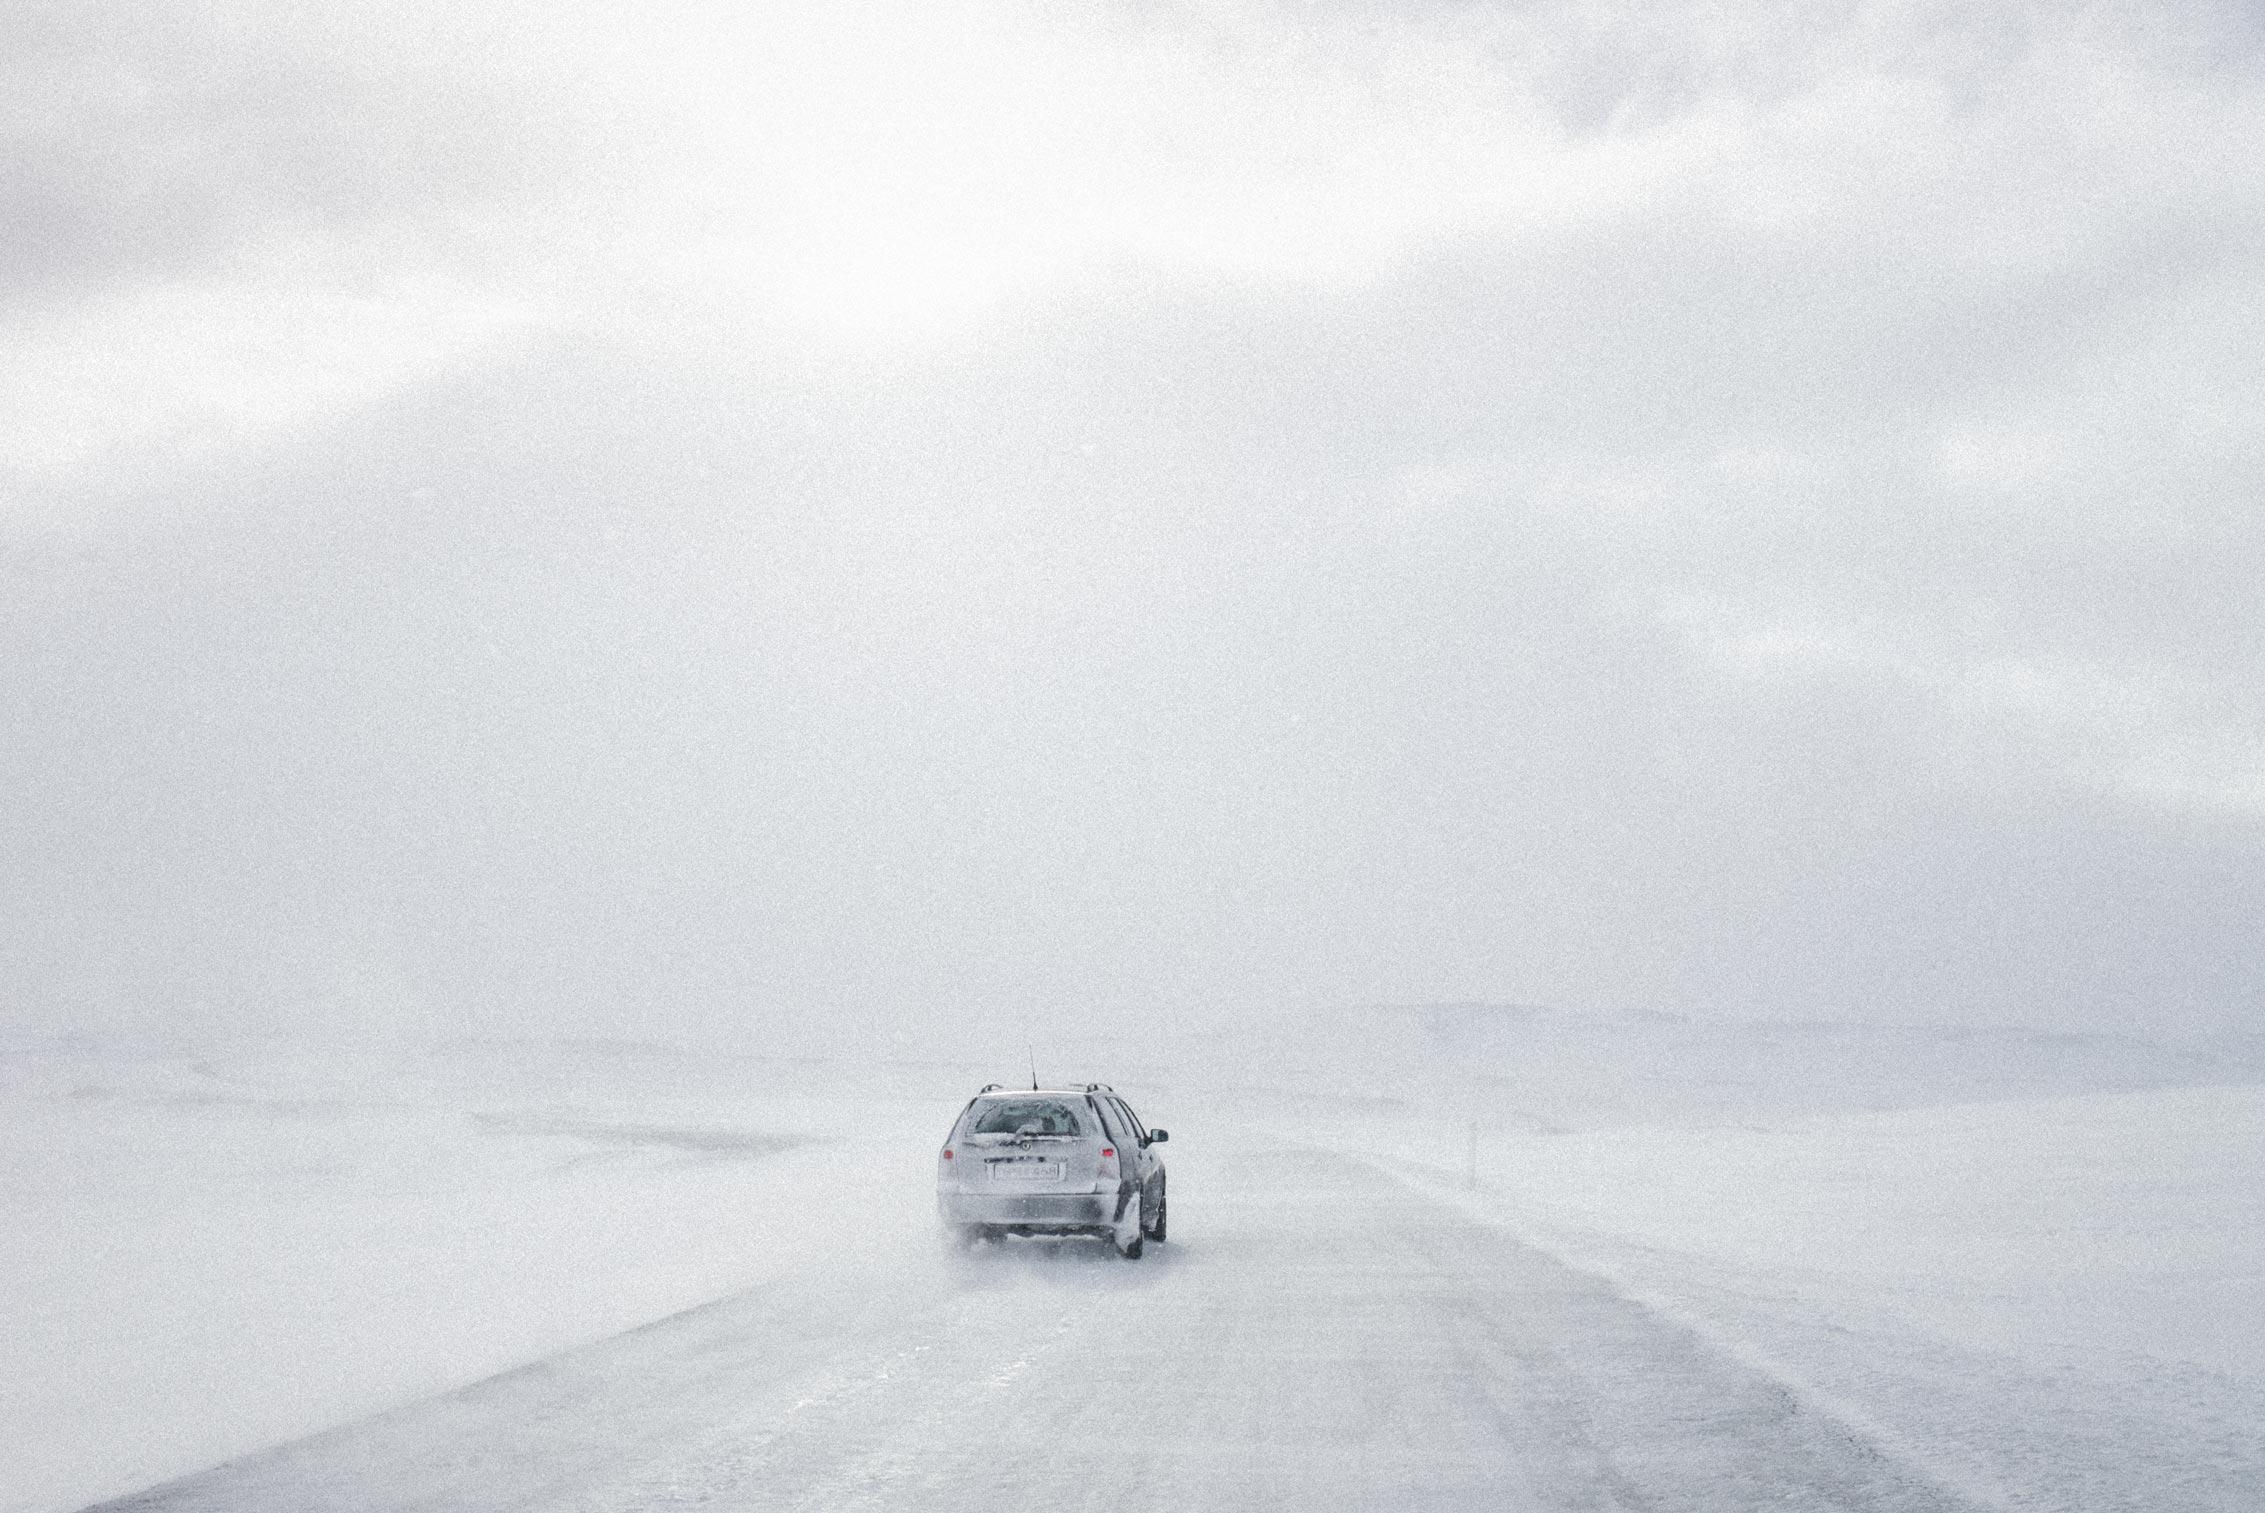 Daniel_Zvereff-iceland-car-snow-1008468